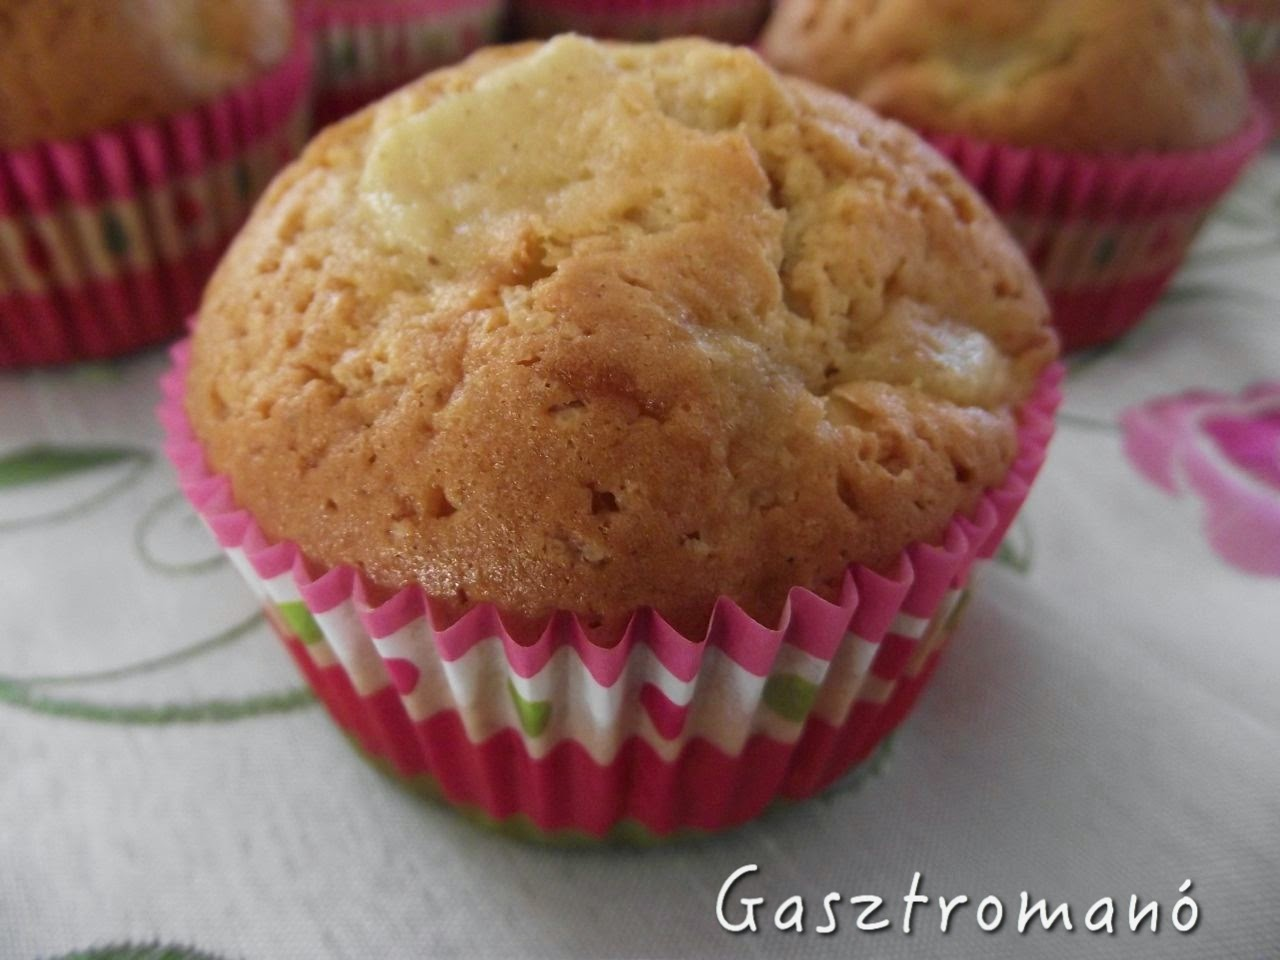 mézes-körtés muffin